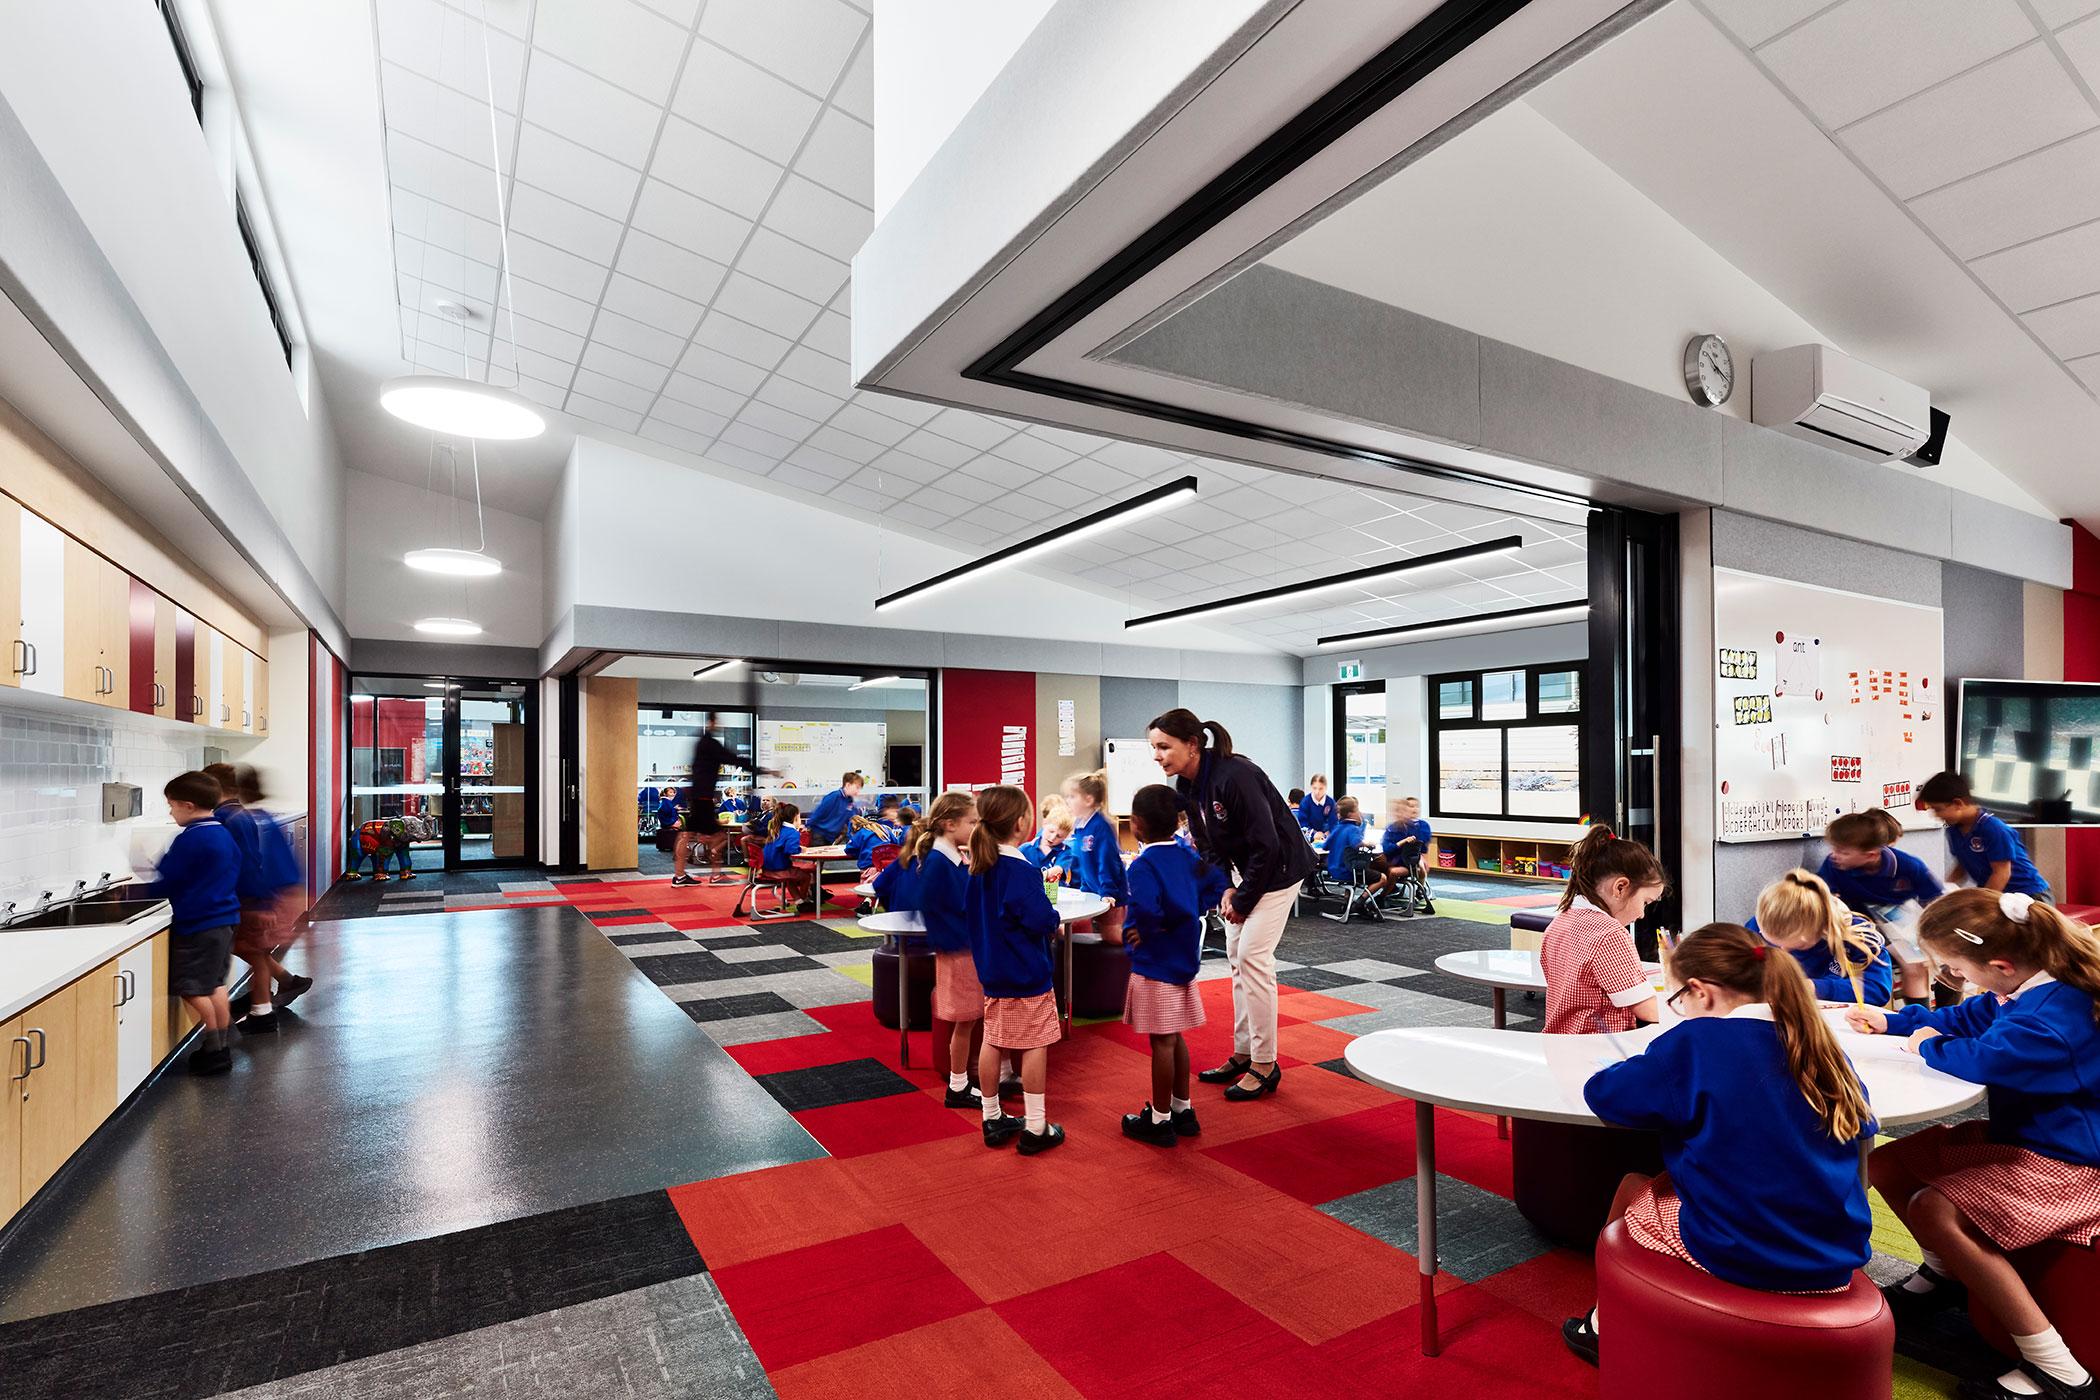 ST ITA'S PRIMARY SCHOOL 6